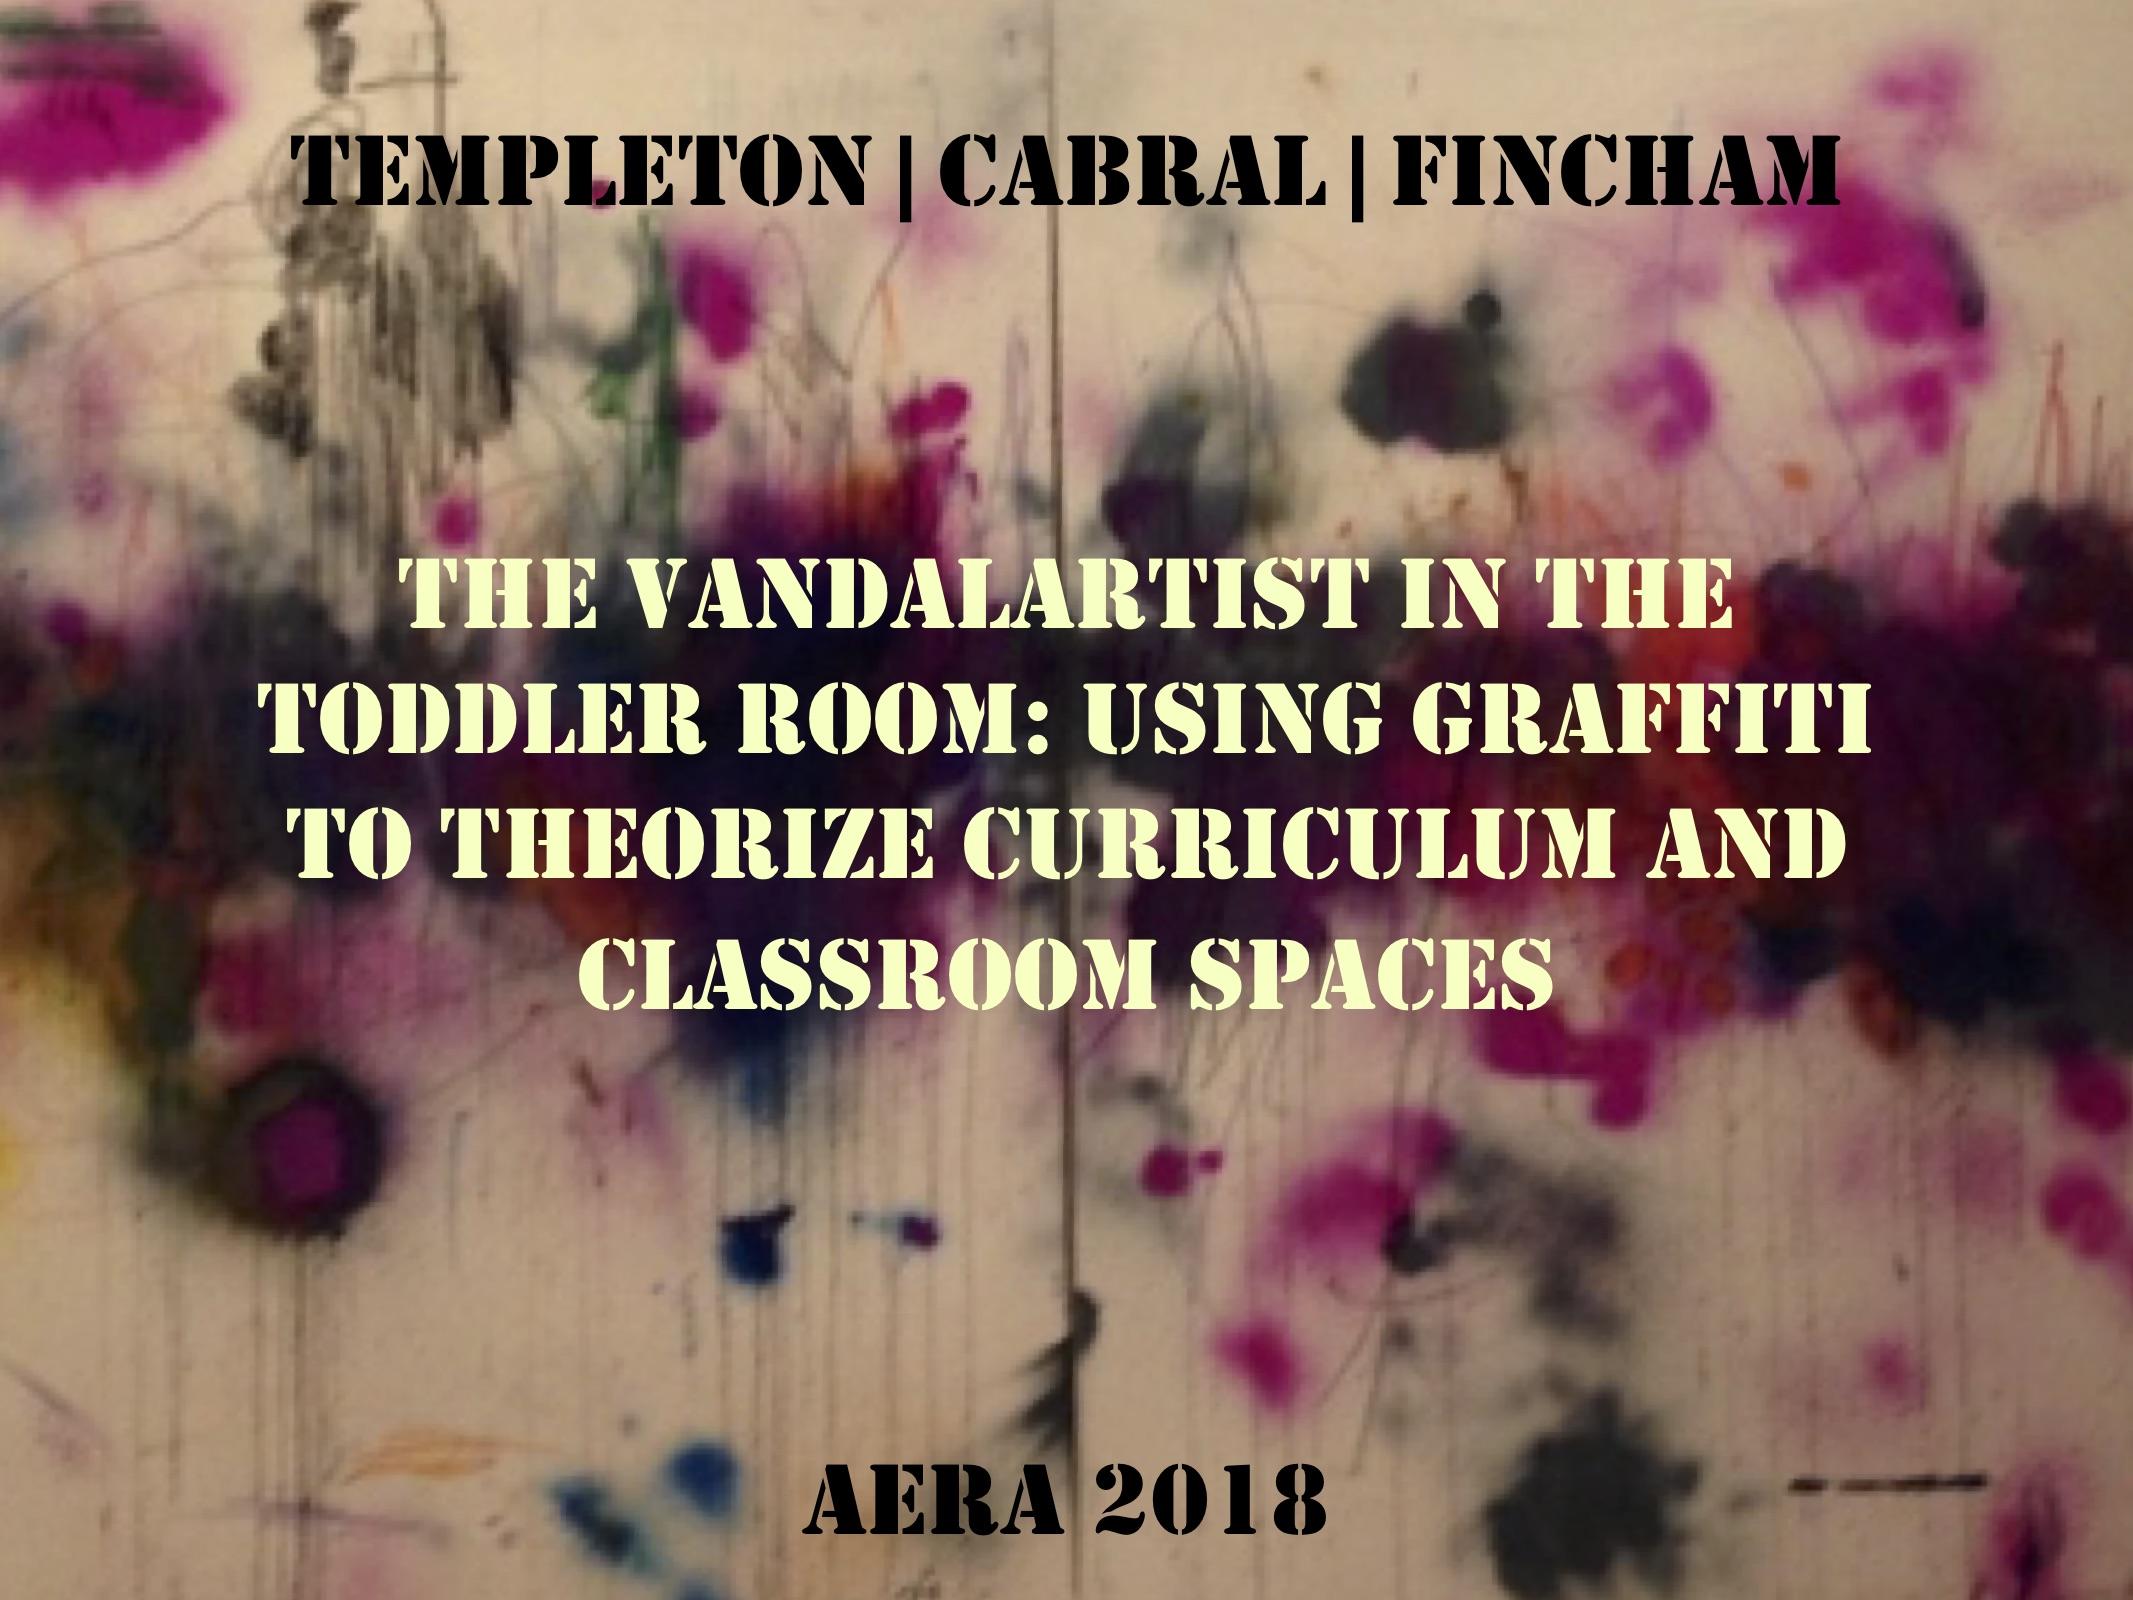 AERA2018_Fincham_Templeton_Cabral.jpg